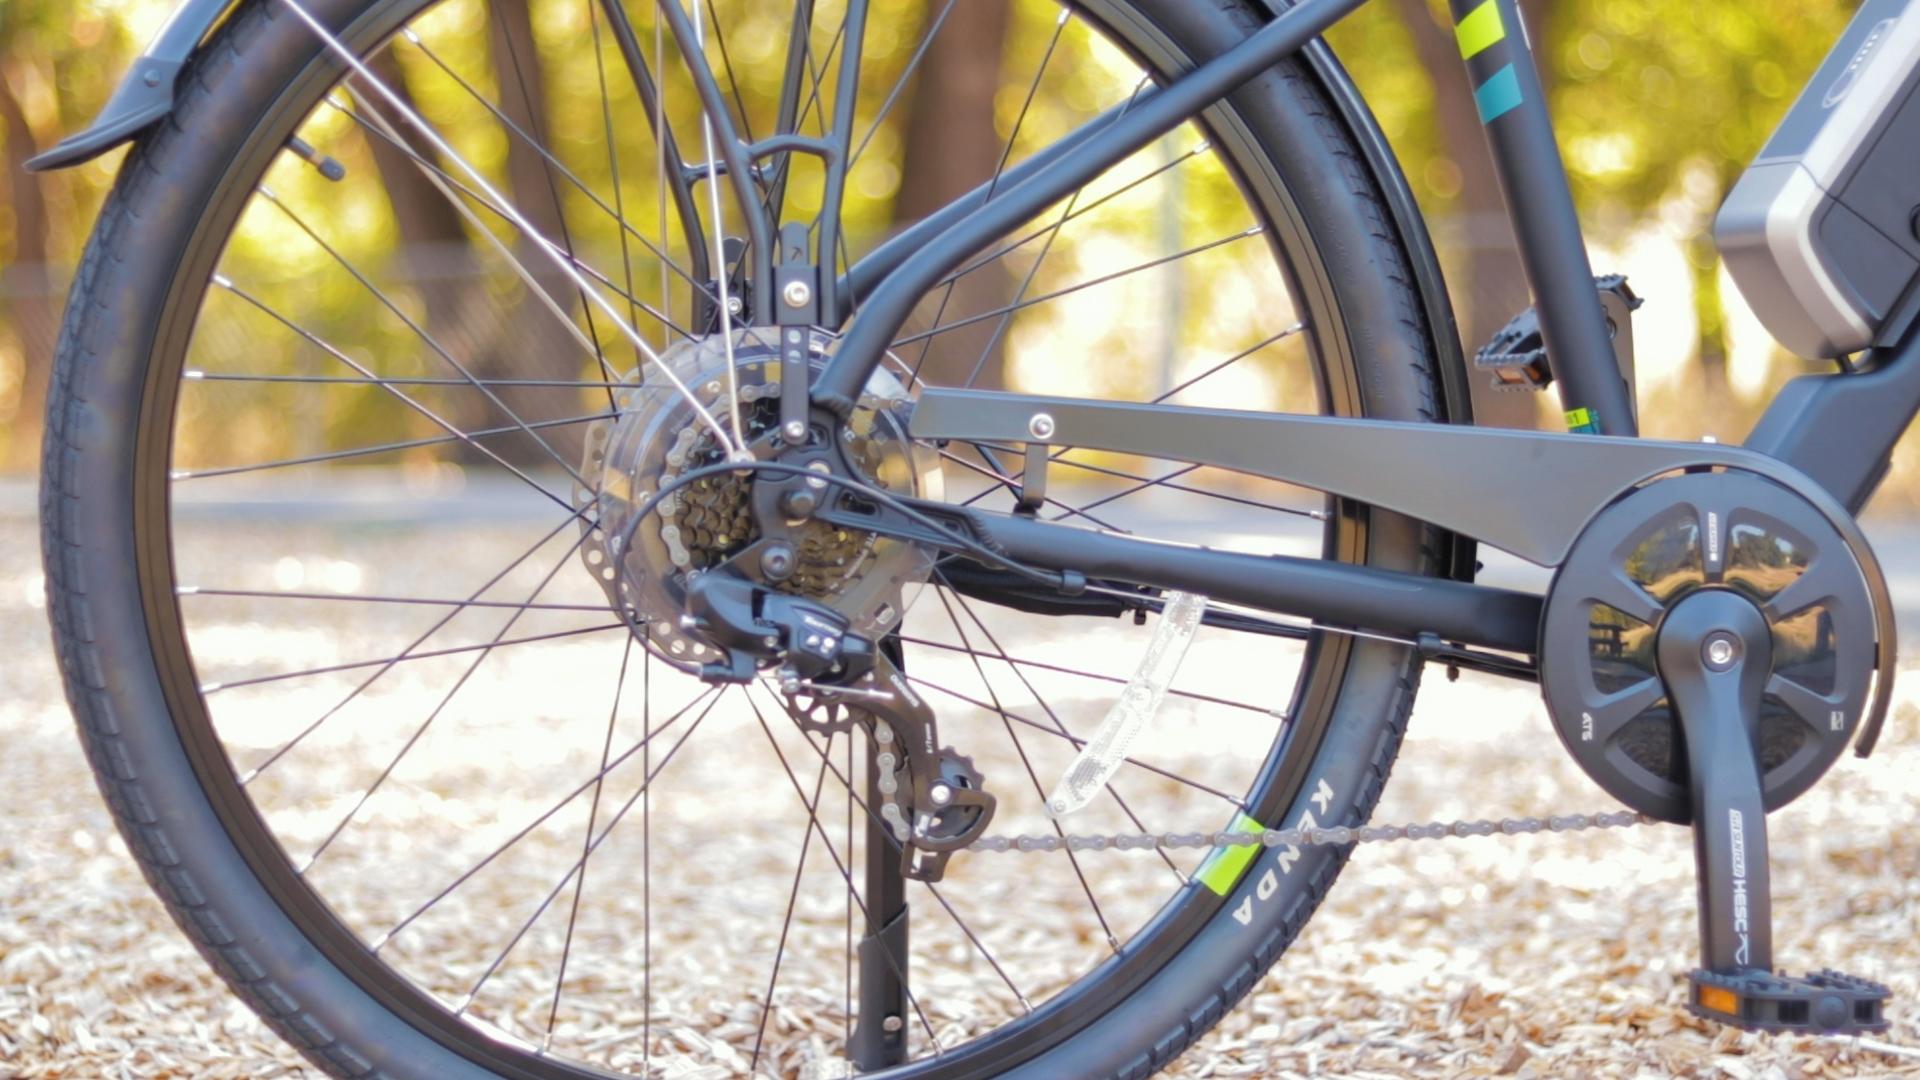 electrified-reviews-izip-e3-brio-electric-bike-review-shimano-tourney-derraileur-far.jpg